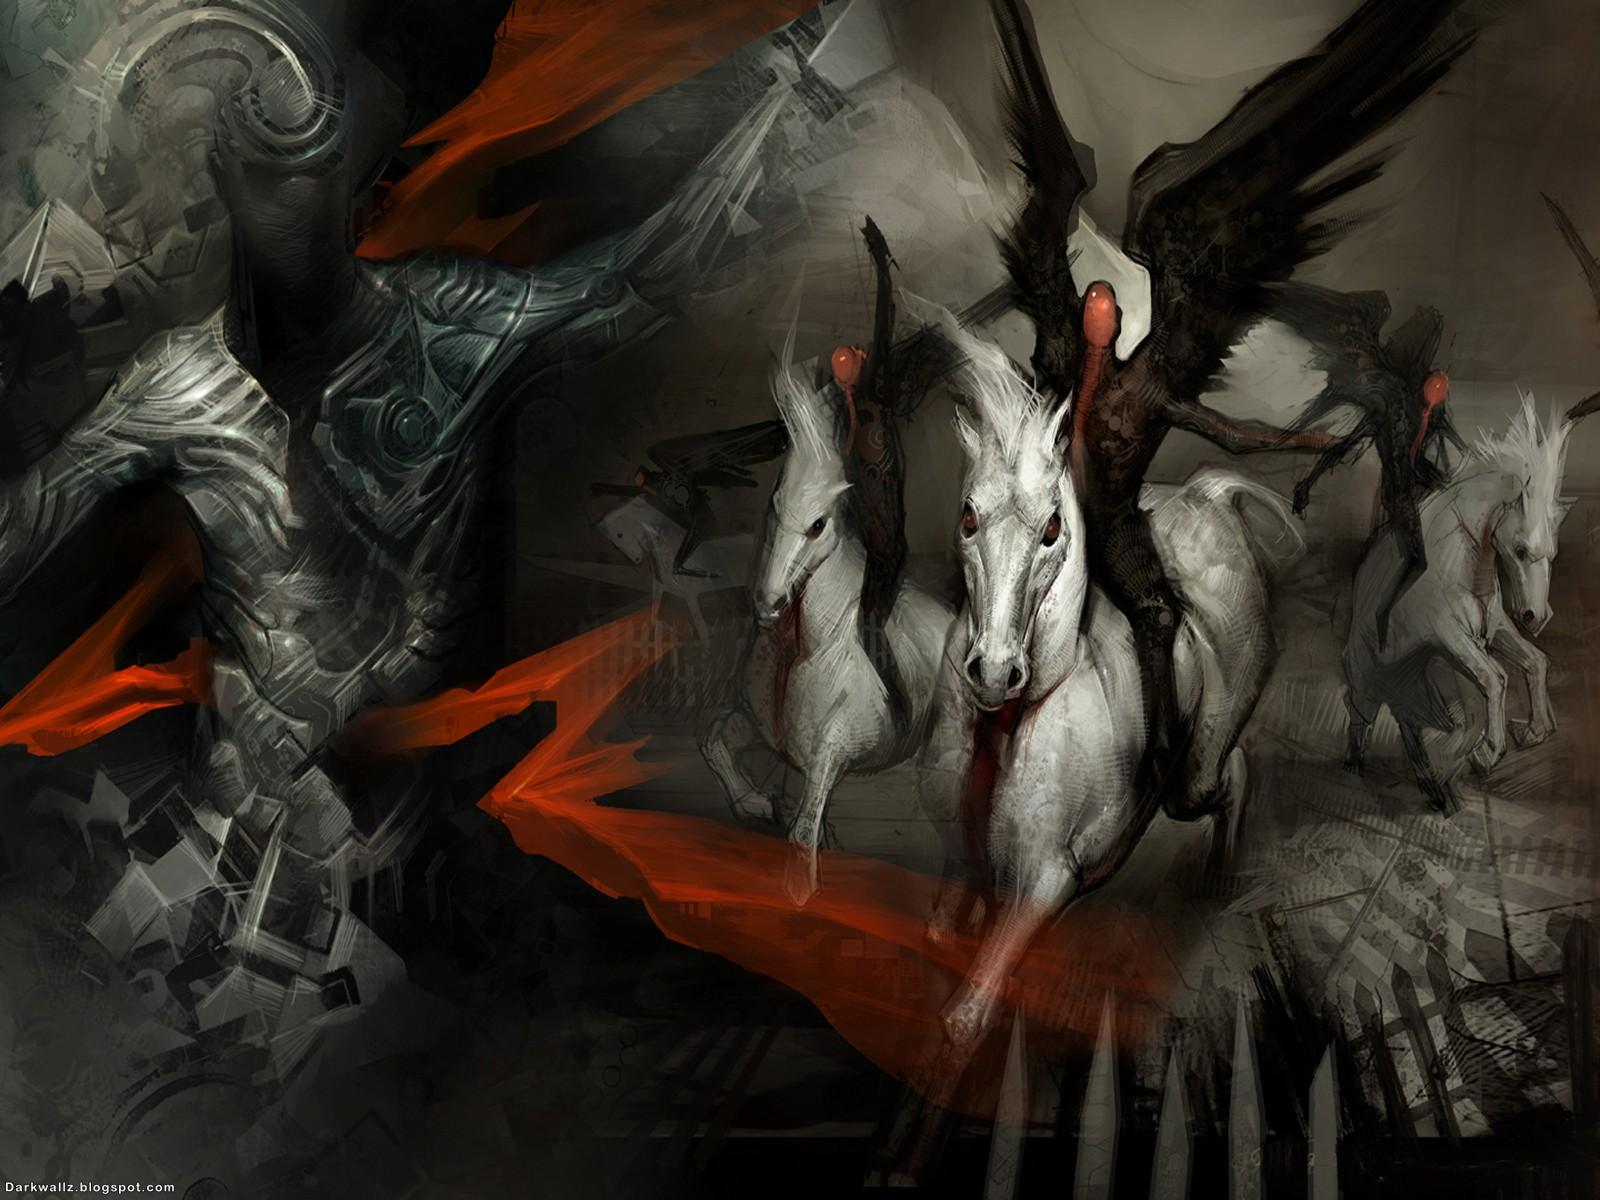 http://3.bp.blogspot.com/_-jo2ZCYhKaY/S62e7k-t35I/AAAAAAAAHMs/yQ9UeGTDSCc/s1600/Dark_Angel_Wallpapers_27%20(darkwallz.blogspot.com).jpg